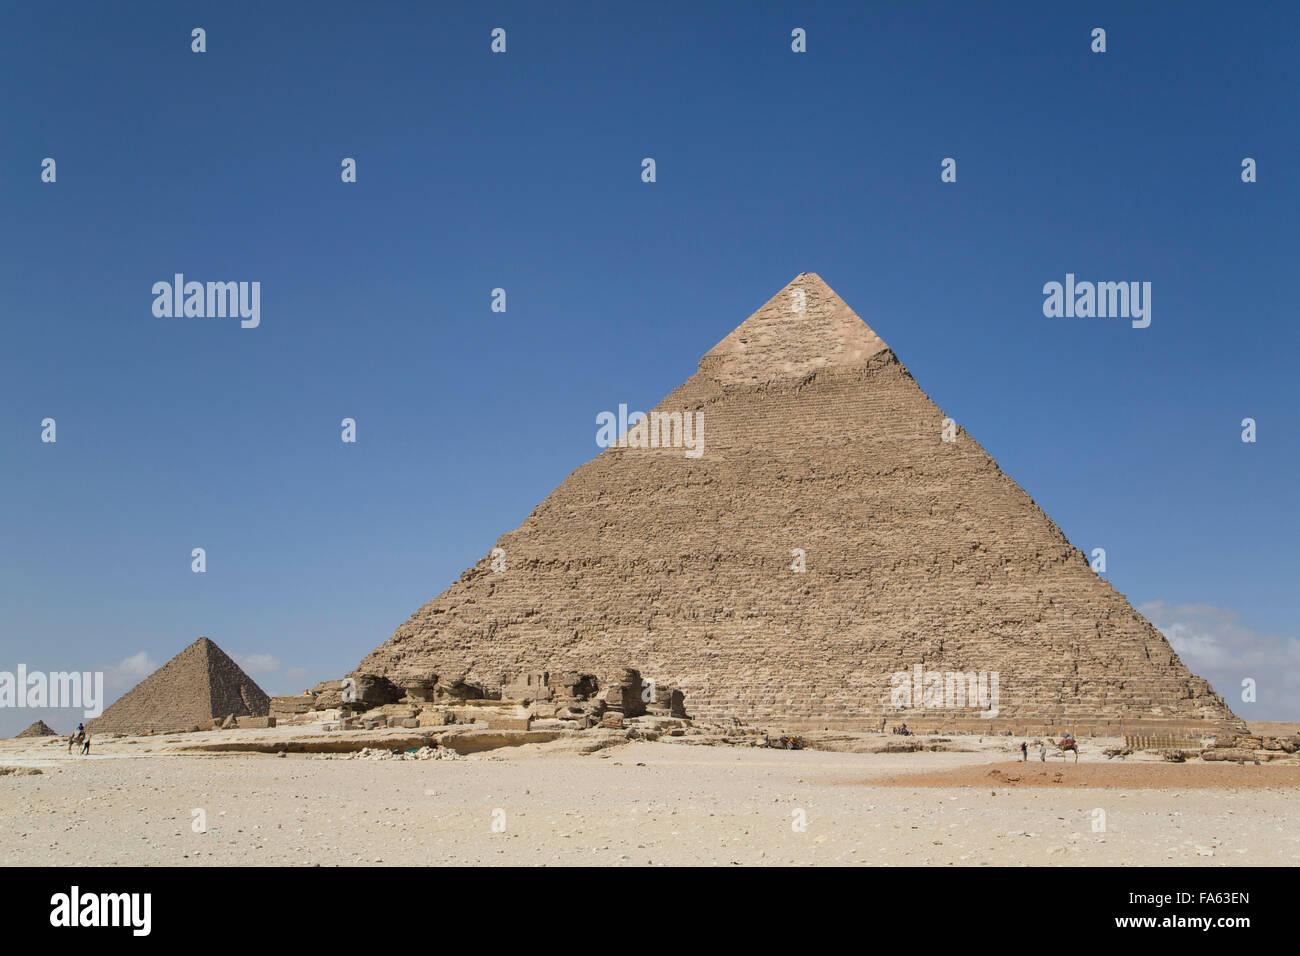 Pyramide de Khéphren ou Khafré (premier plan), les pyramides de Gizeh, Giza, Egypte Photo Stock